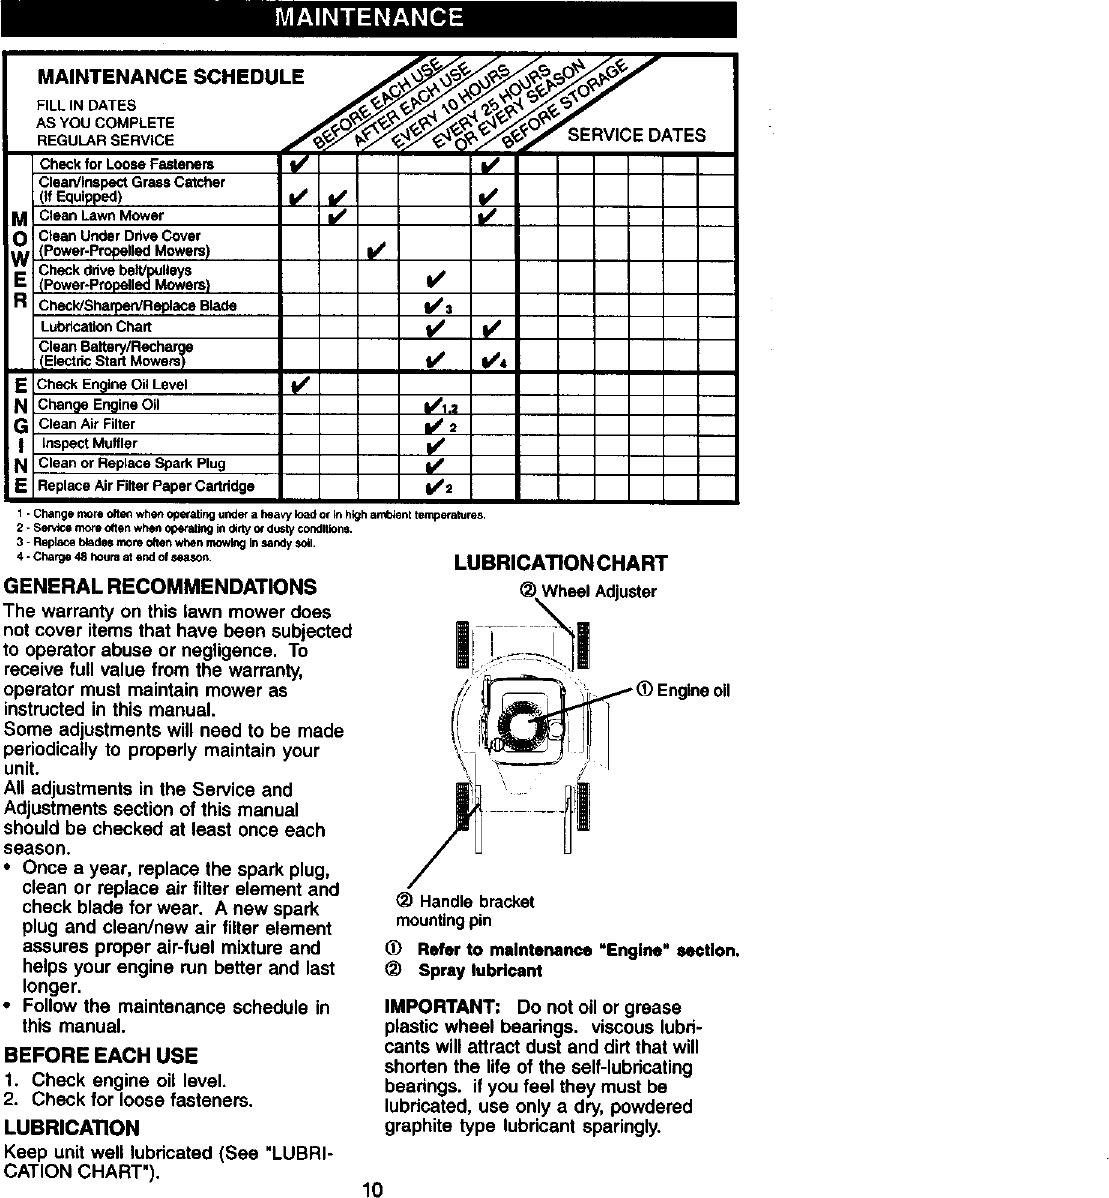 Craftsman 917378060 User Manual LAWN MOWER Manuals And